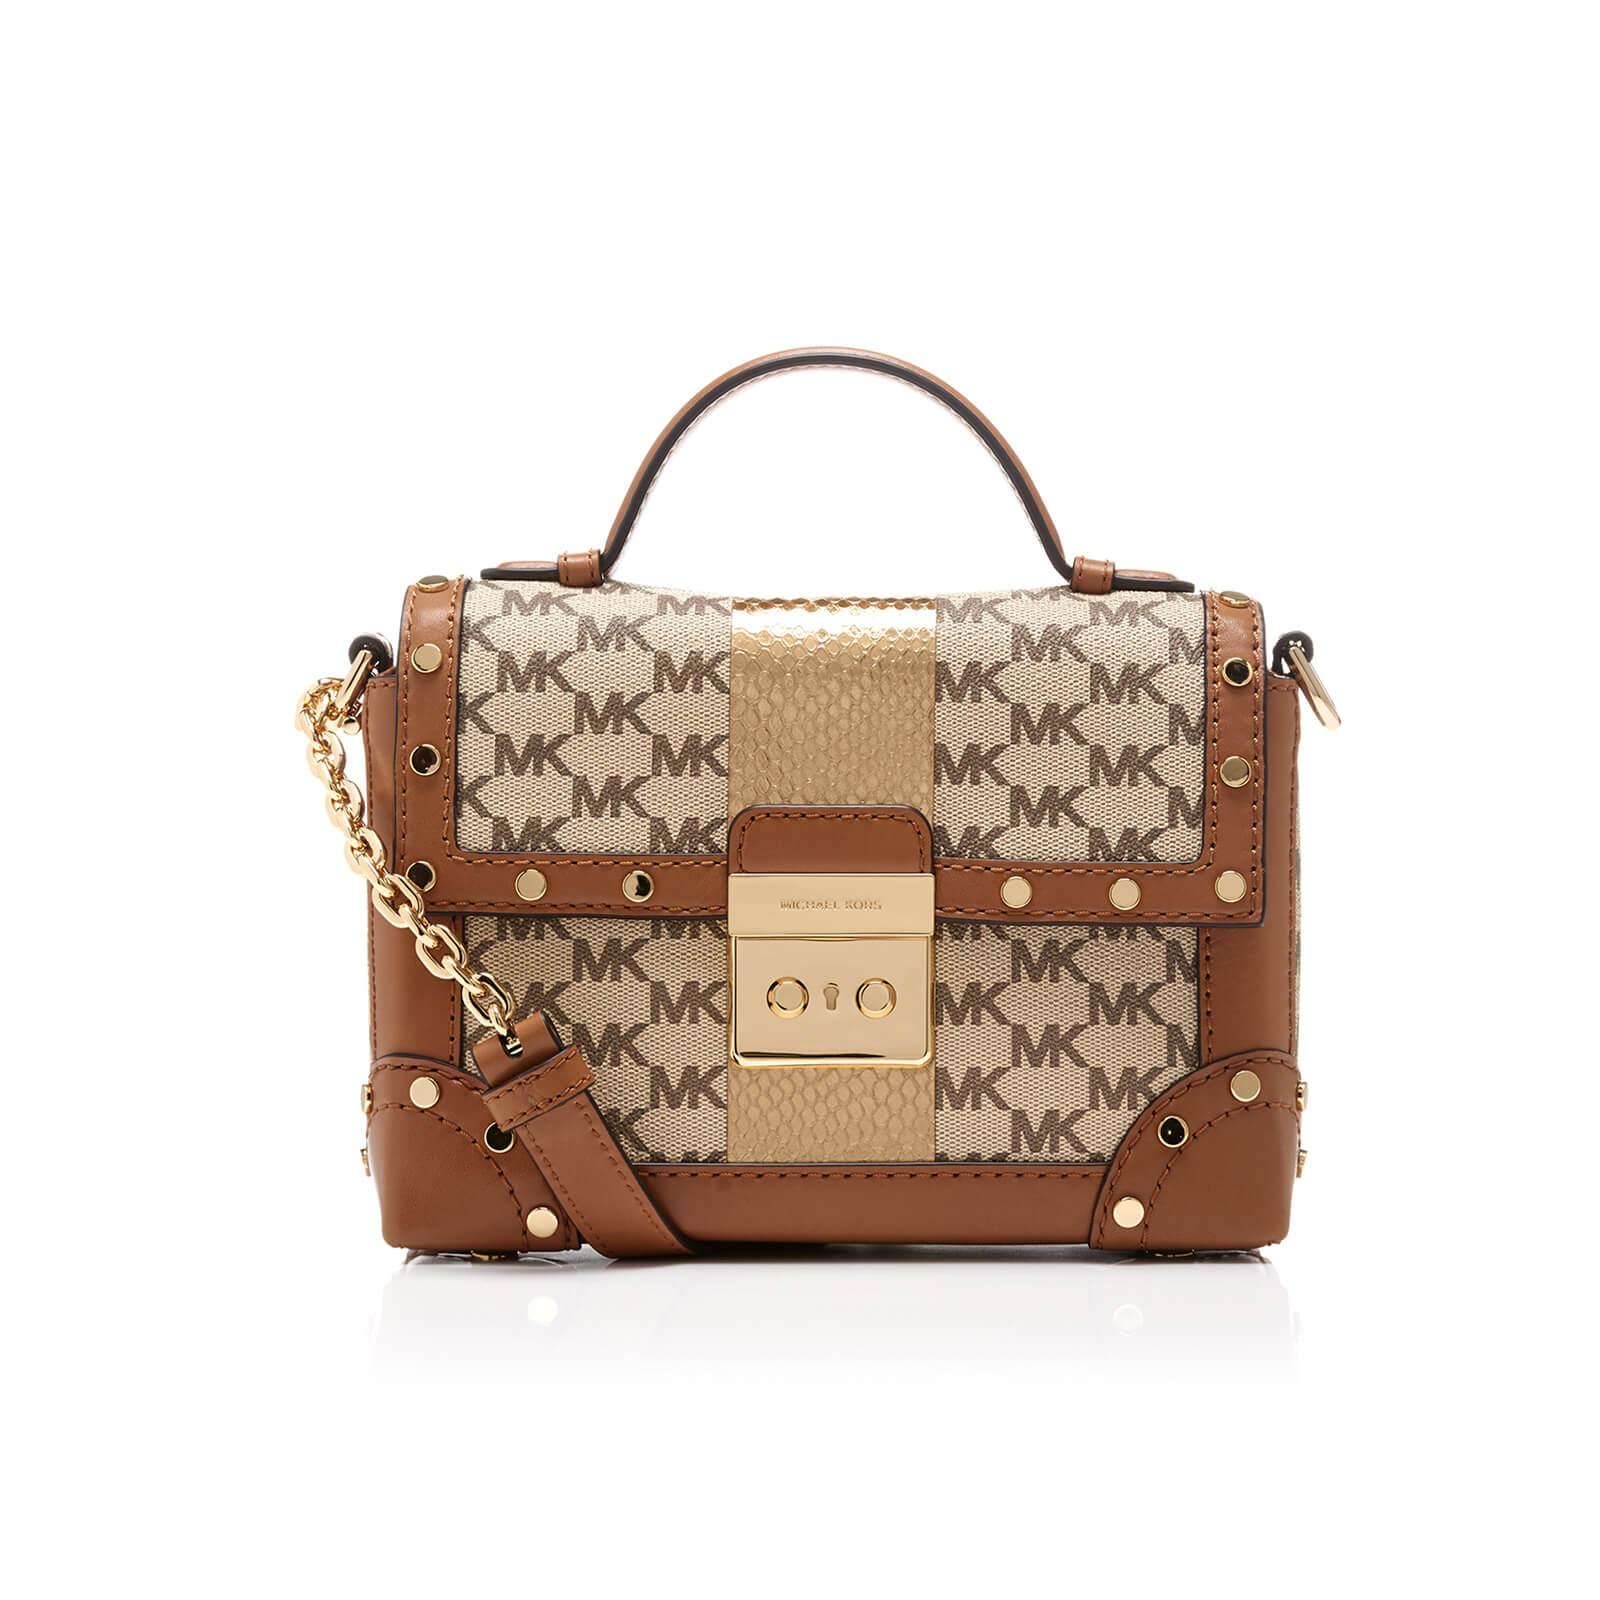 3118f1f7fec3a MICHAEL MICHAEL KORS Women s Centre Stripe Cori Small Trunk Bag - Natural - Free  UK Delivery over £50